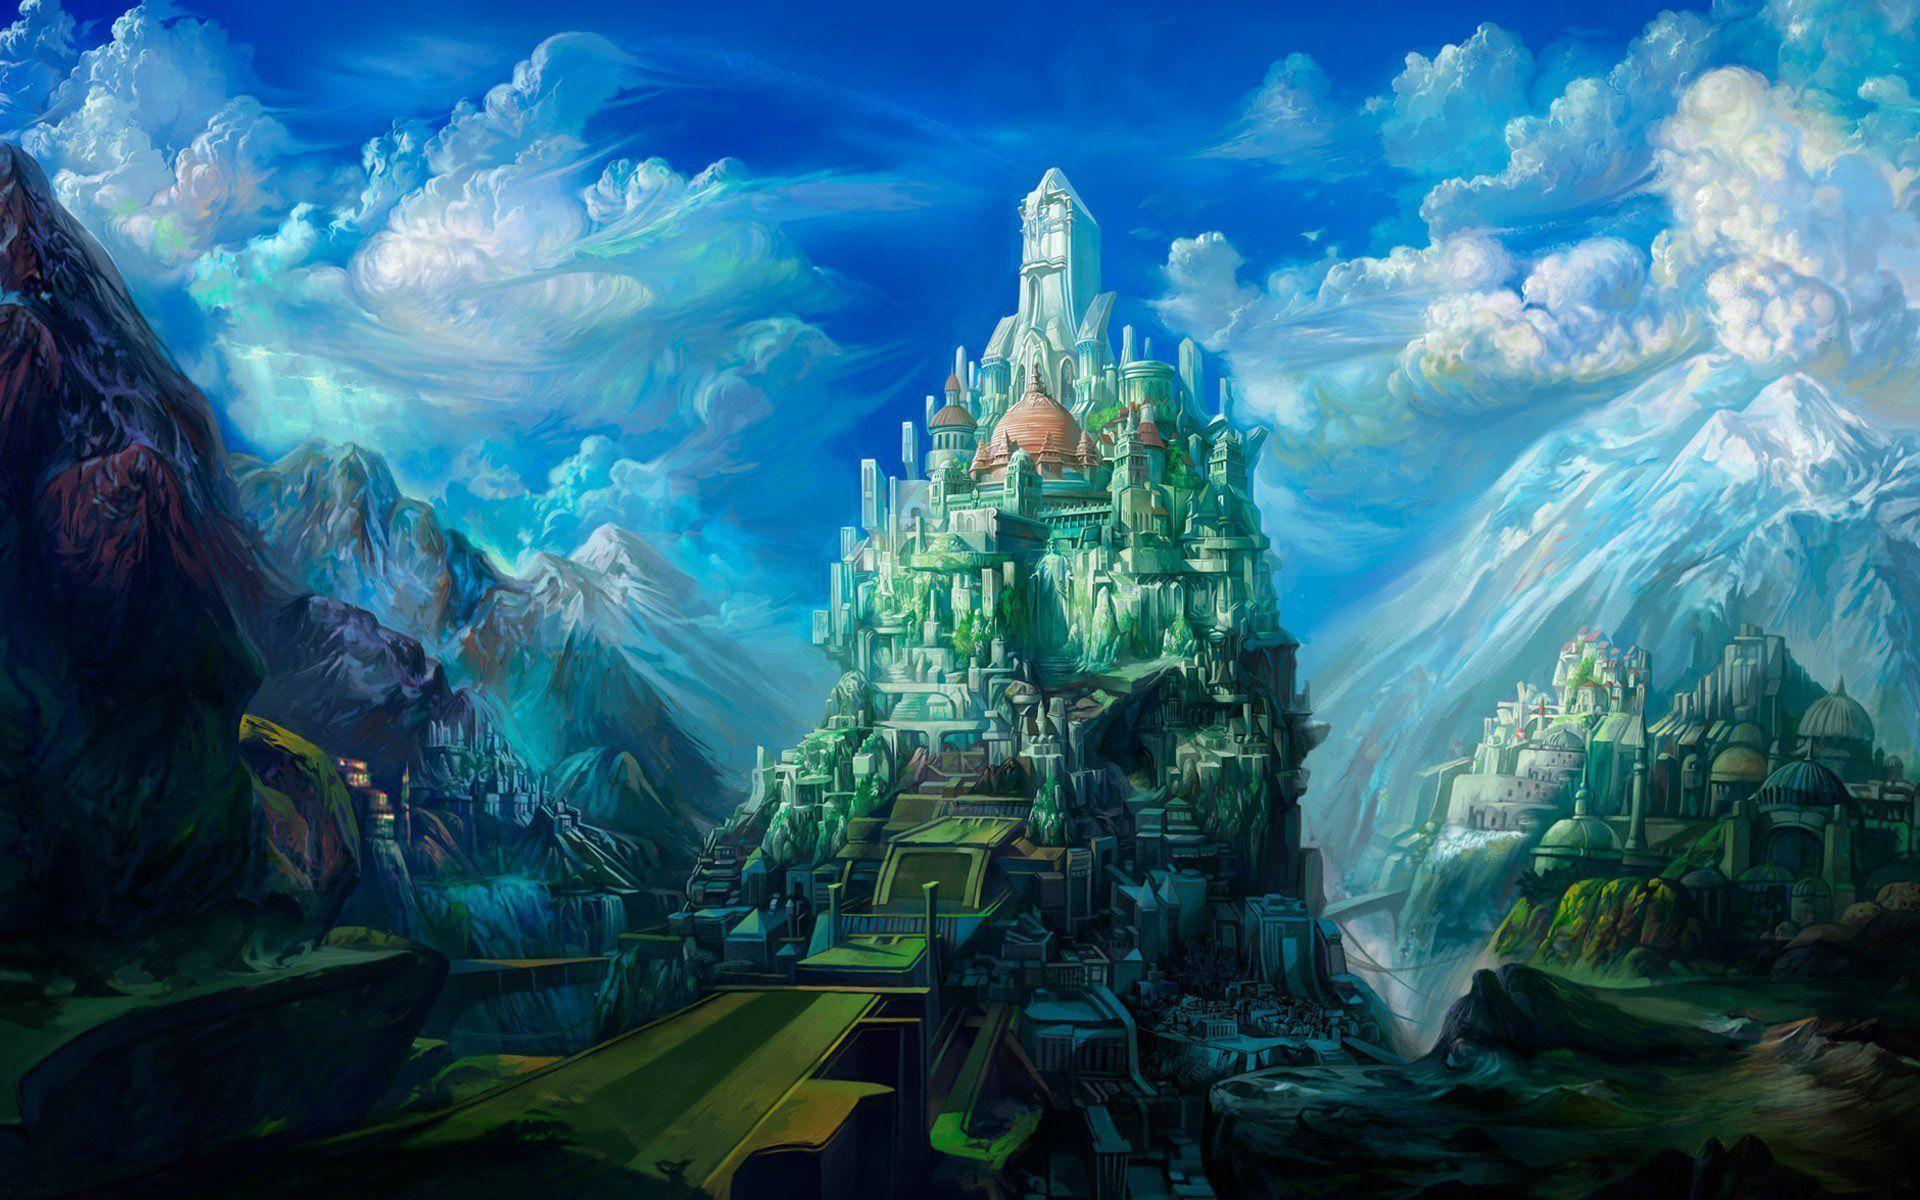 Fantasy Castle Wallpaper HD   Free HD Desktop Wallpaper   Viewhdwall.